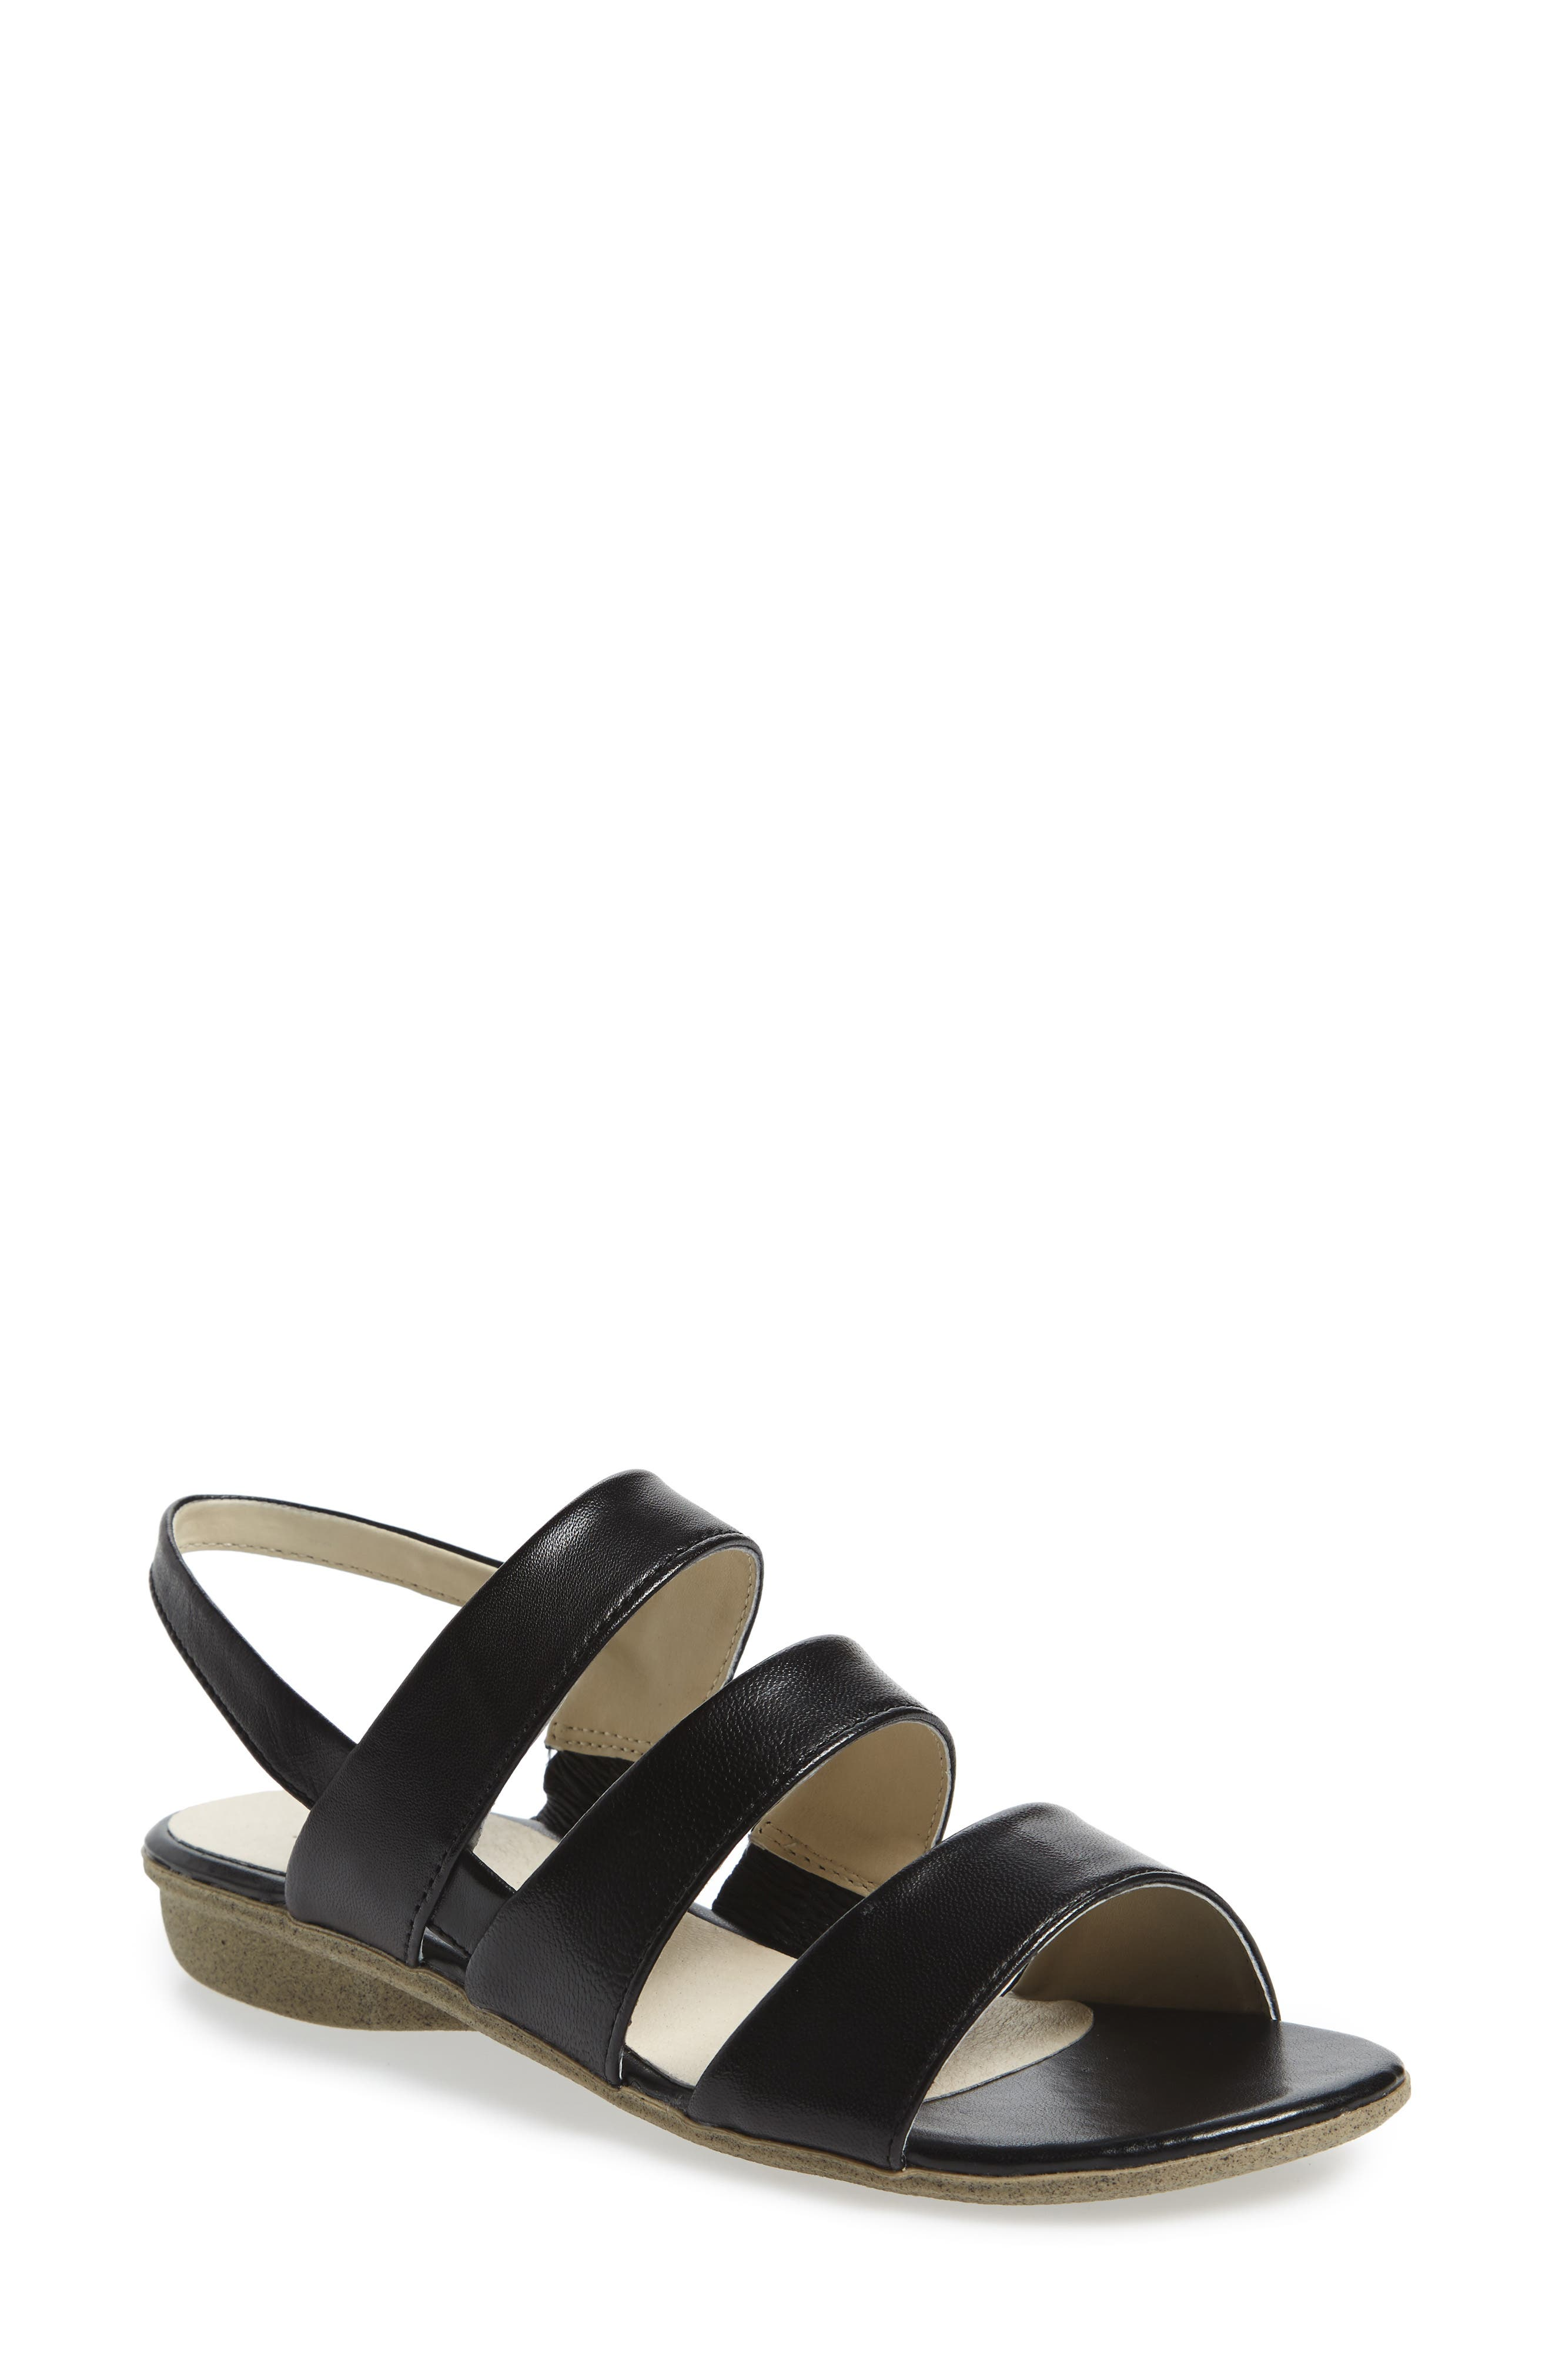 Fabia 11 Sandal,                             Main thumbnail 1, color,                             008